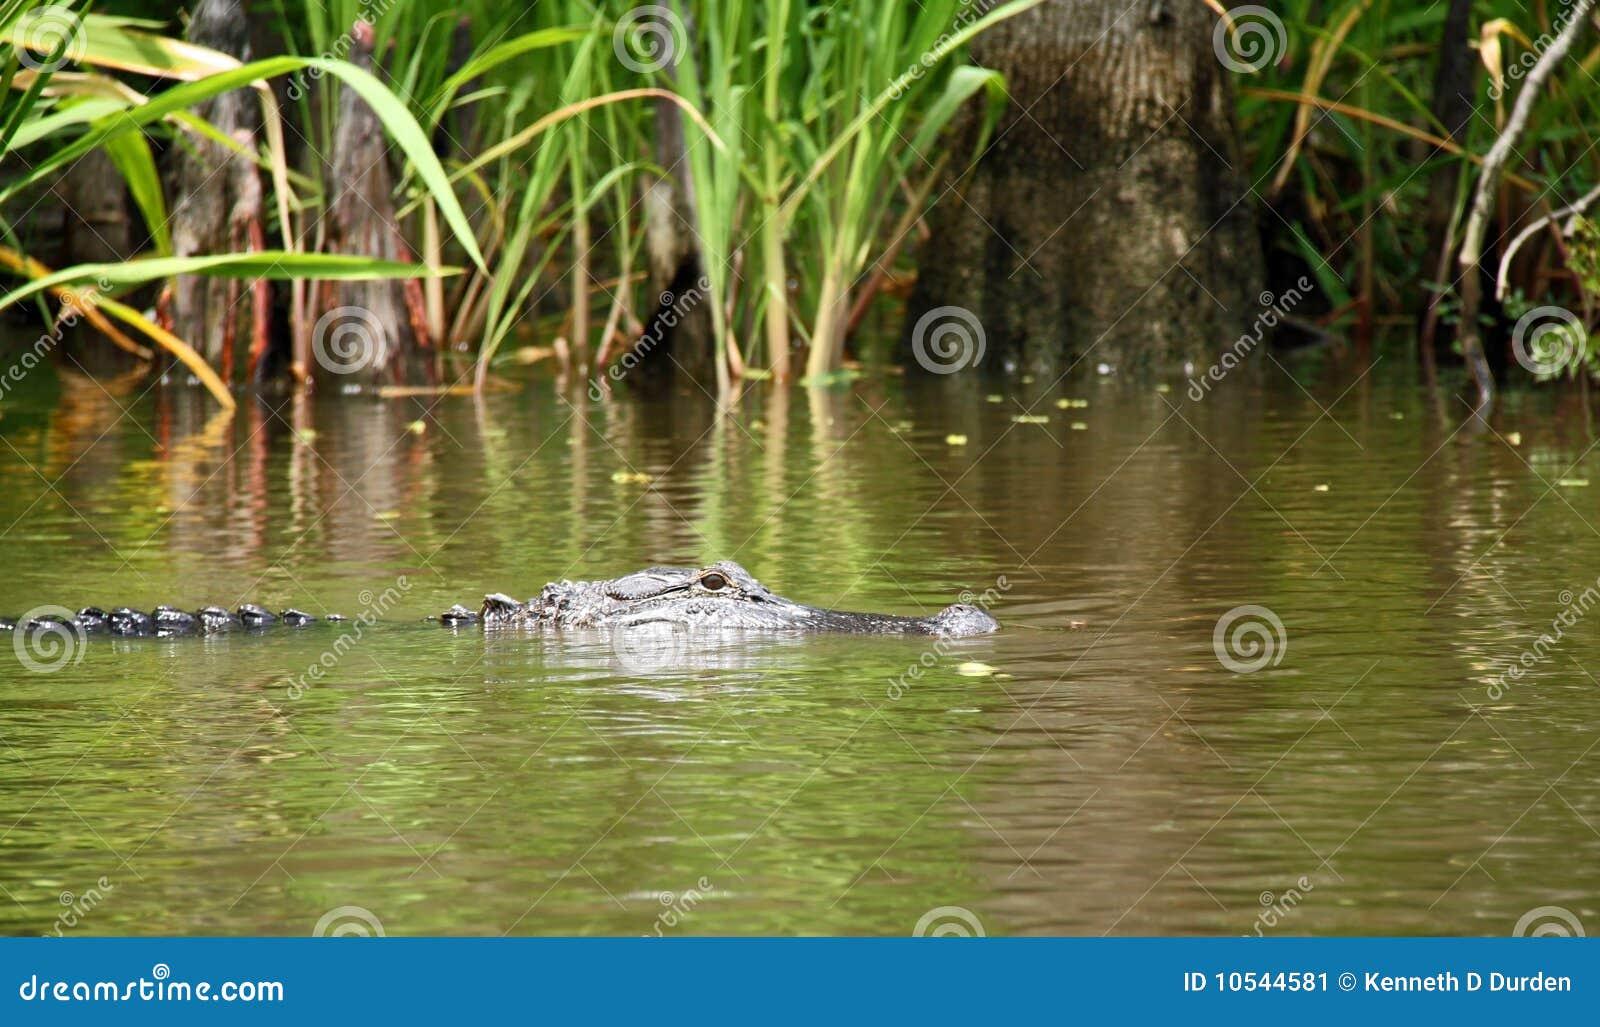 alligator in swamp stock image